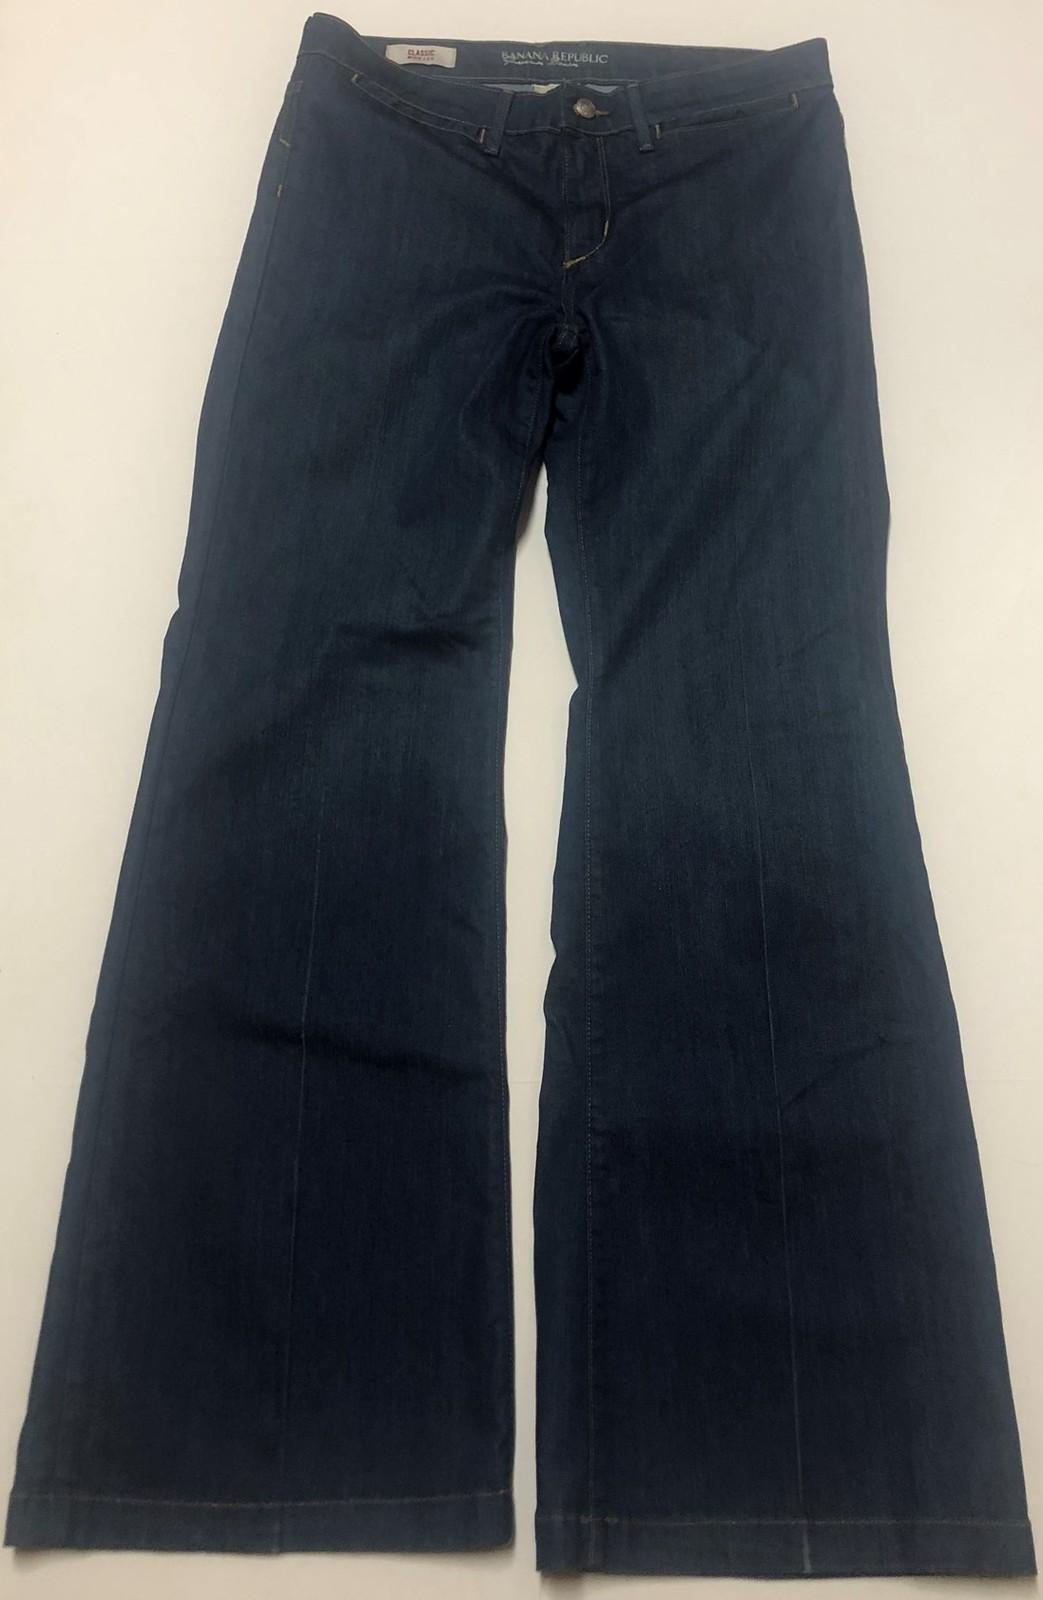 Banana Republic Classic Jeans Sz 10P Stretch Medium Blue Wide Leg image 2